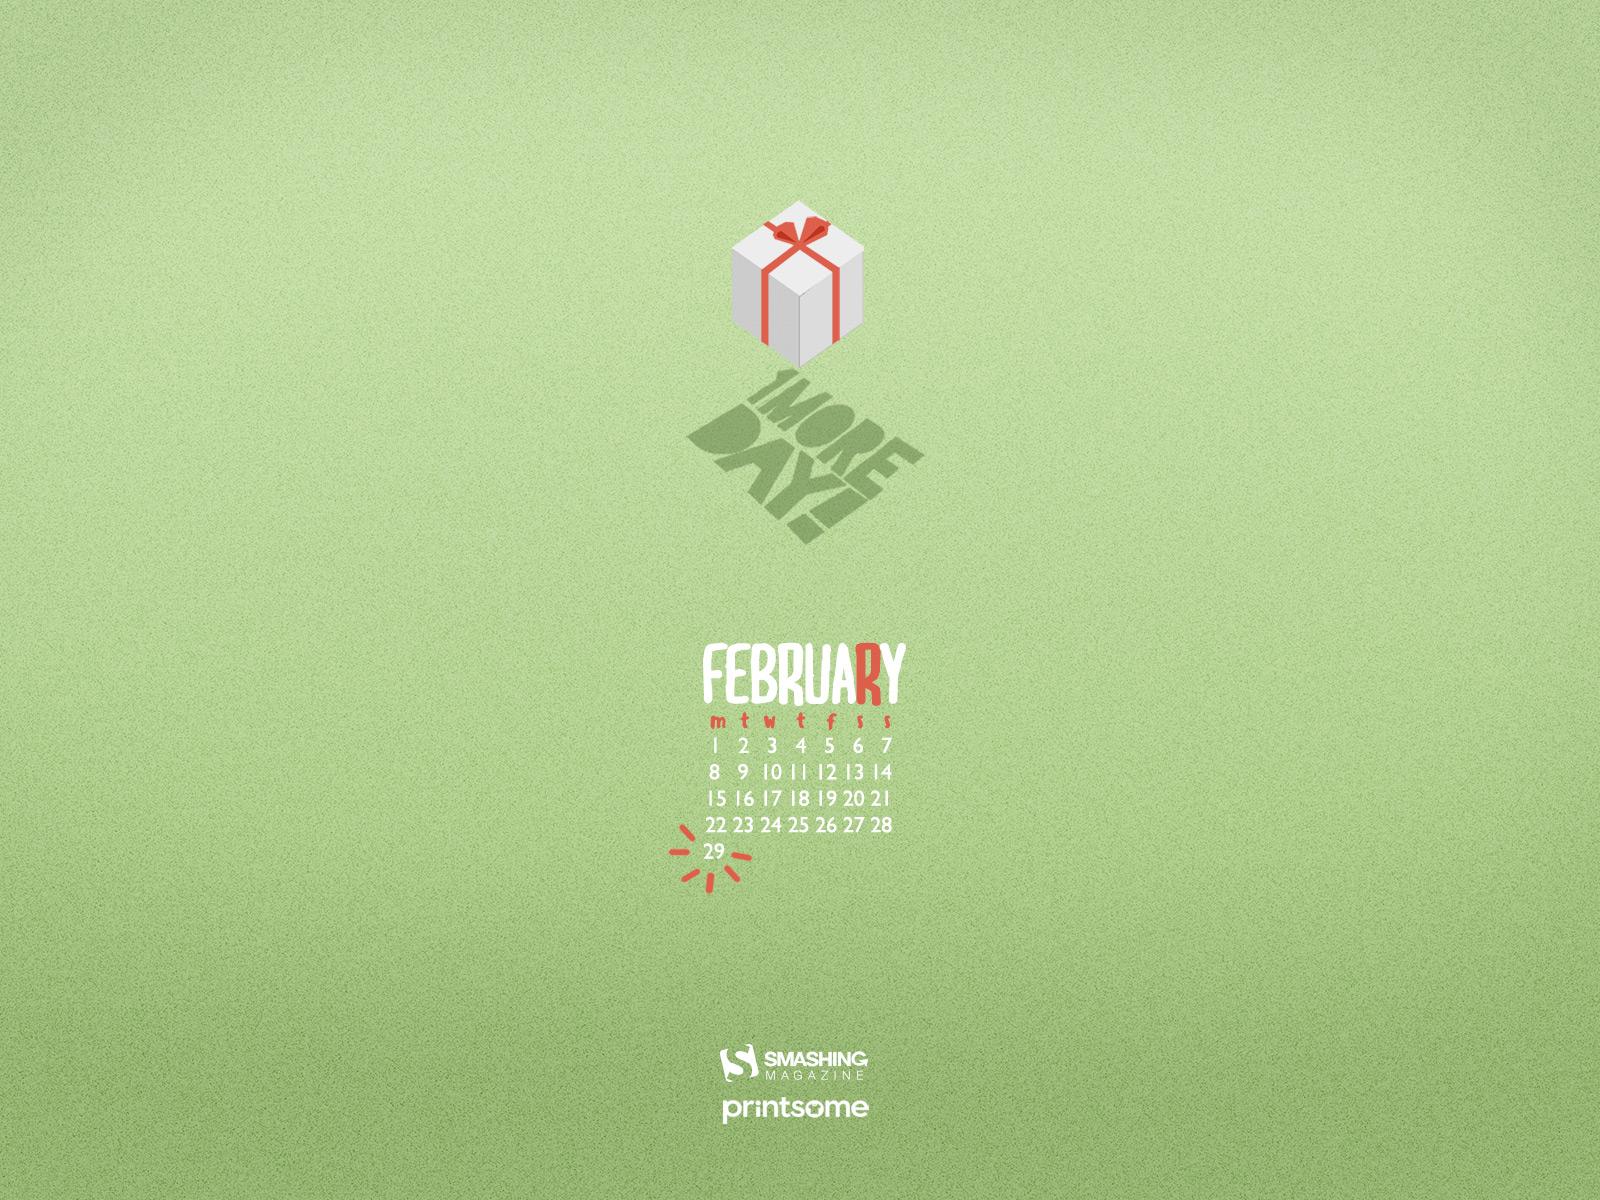 Desktop Wallpaper Calendars February 2016 DigitalMofo 1600x1200